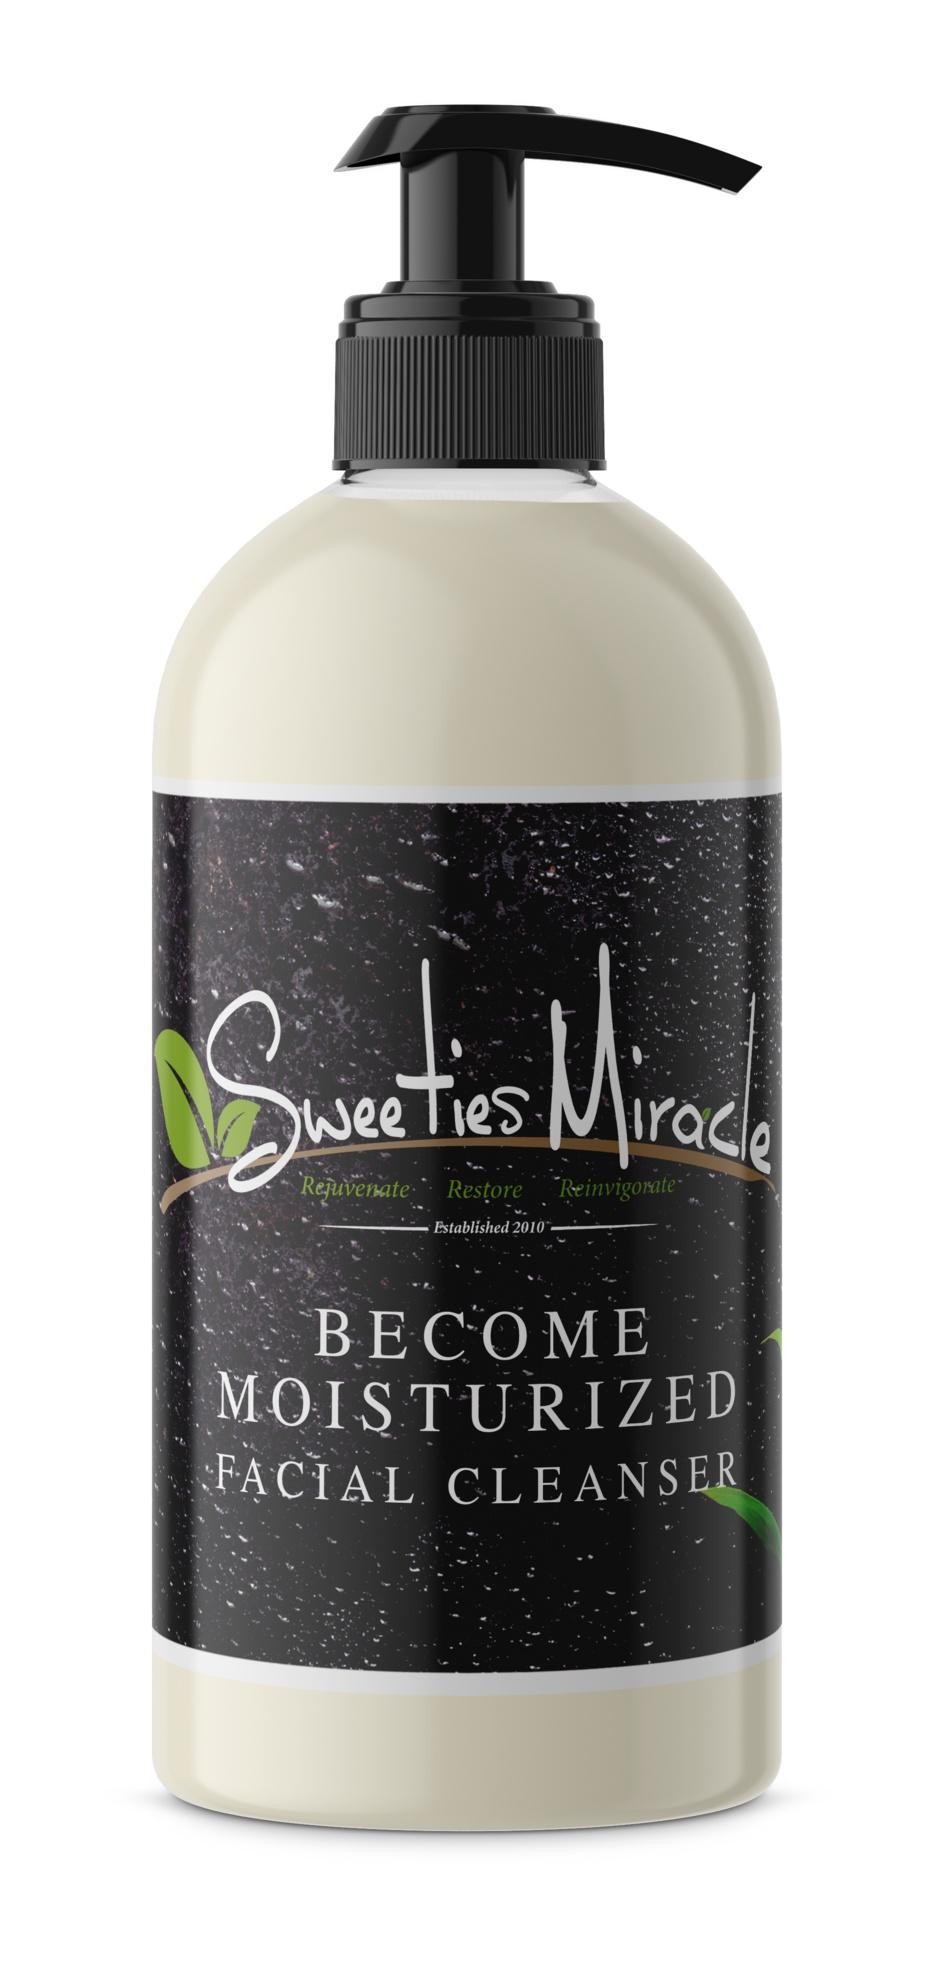 Sweetie's Miracle Tamanu Secret Facial Cleanser